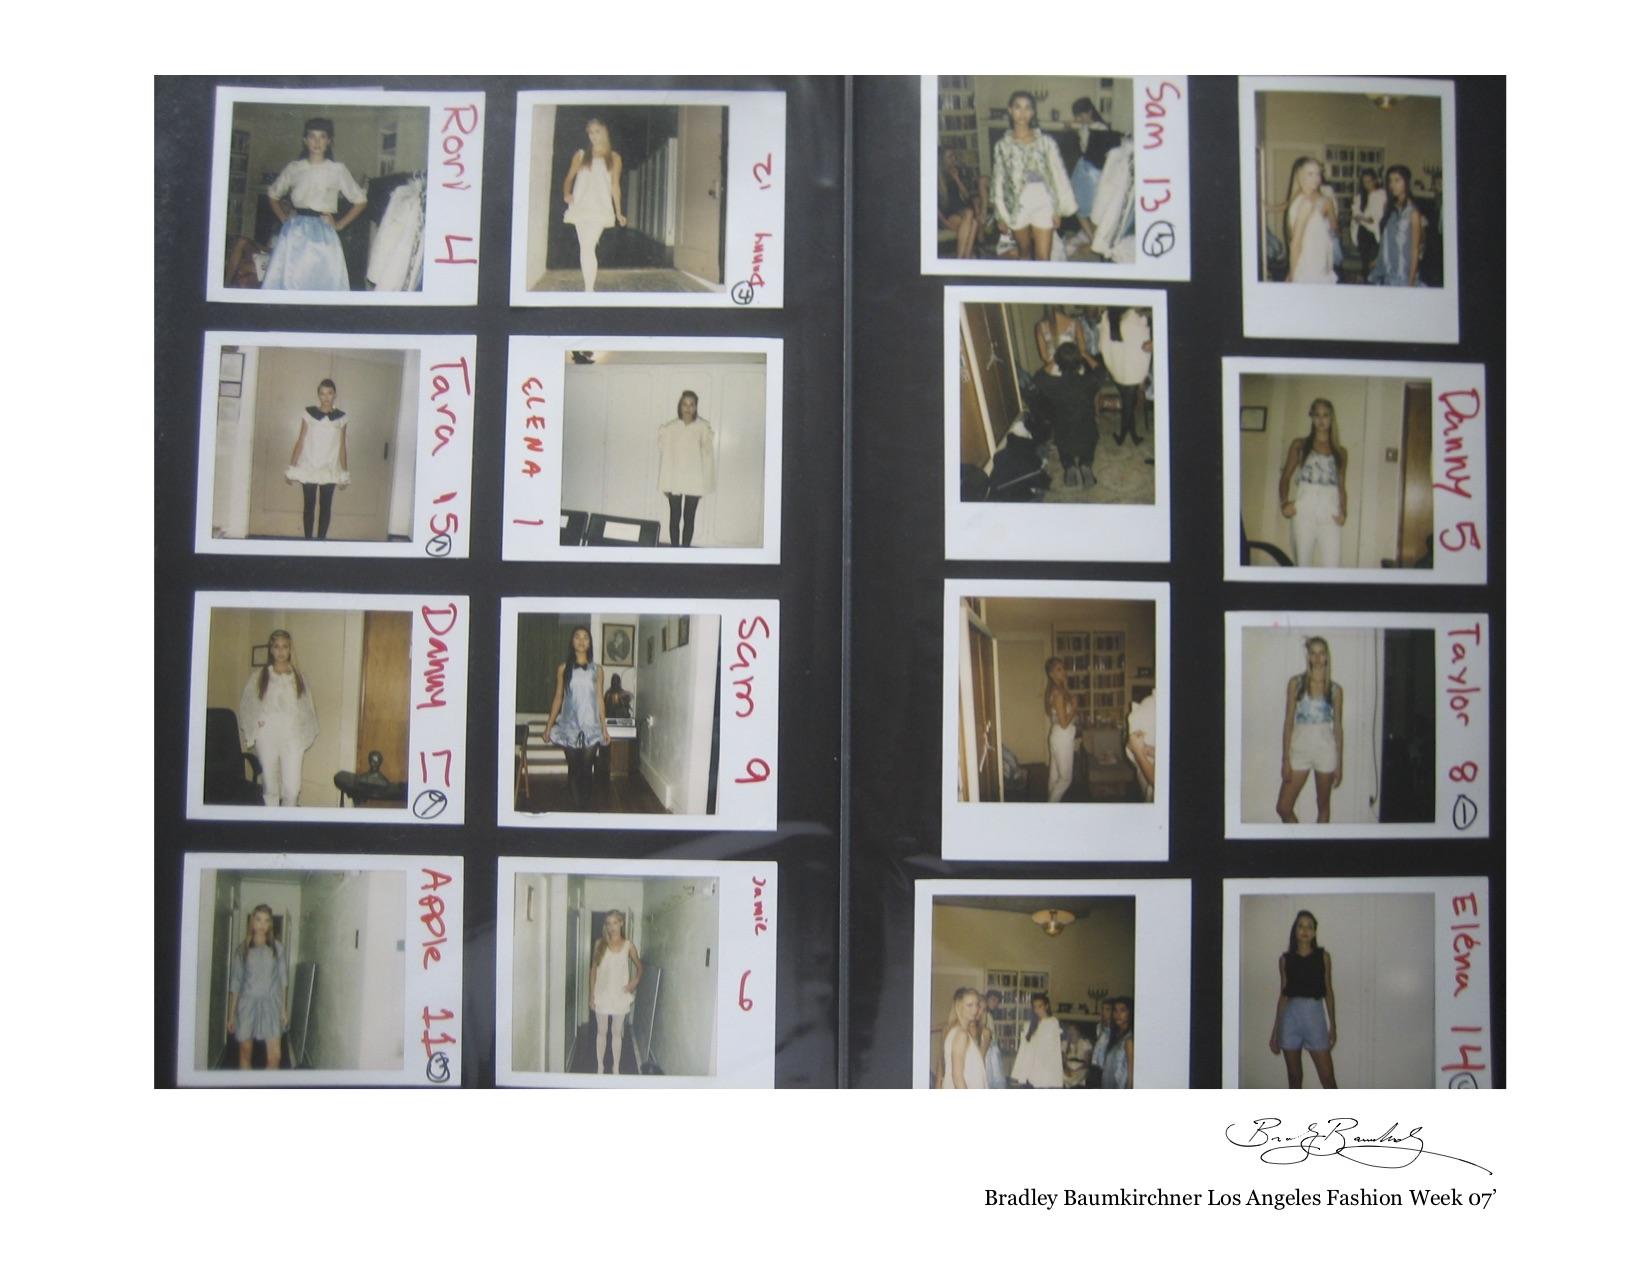 Bradley Baumkirchner La Fashion week.jpg